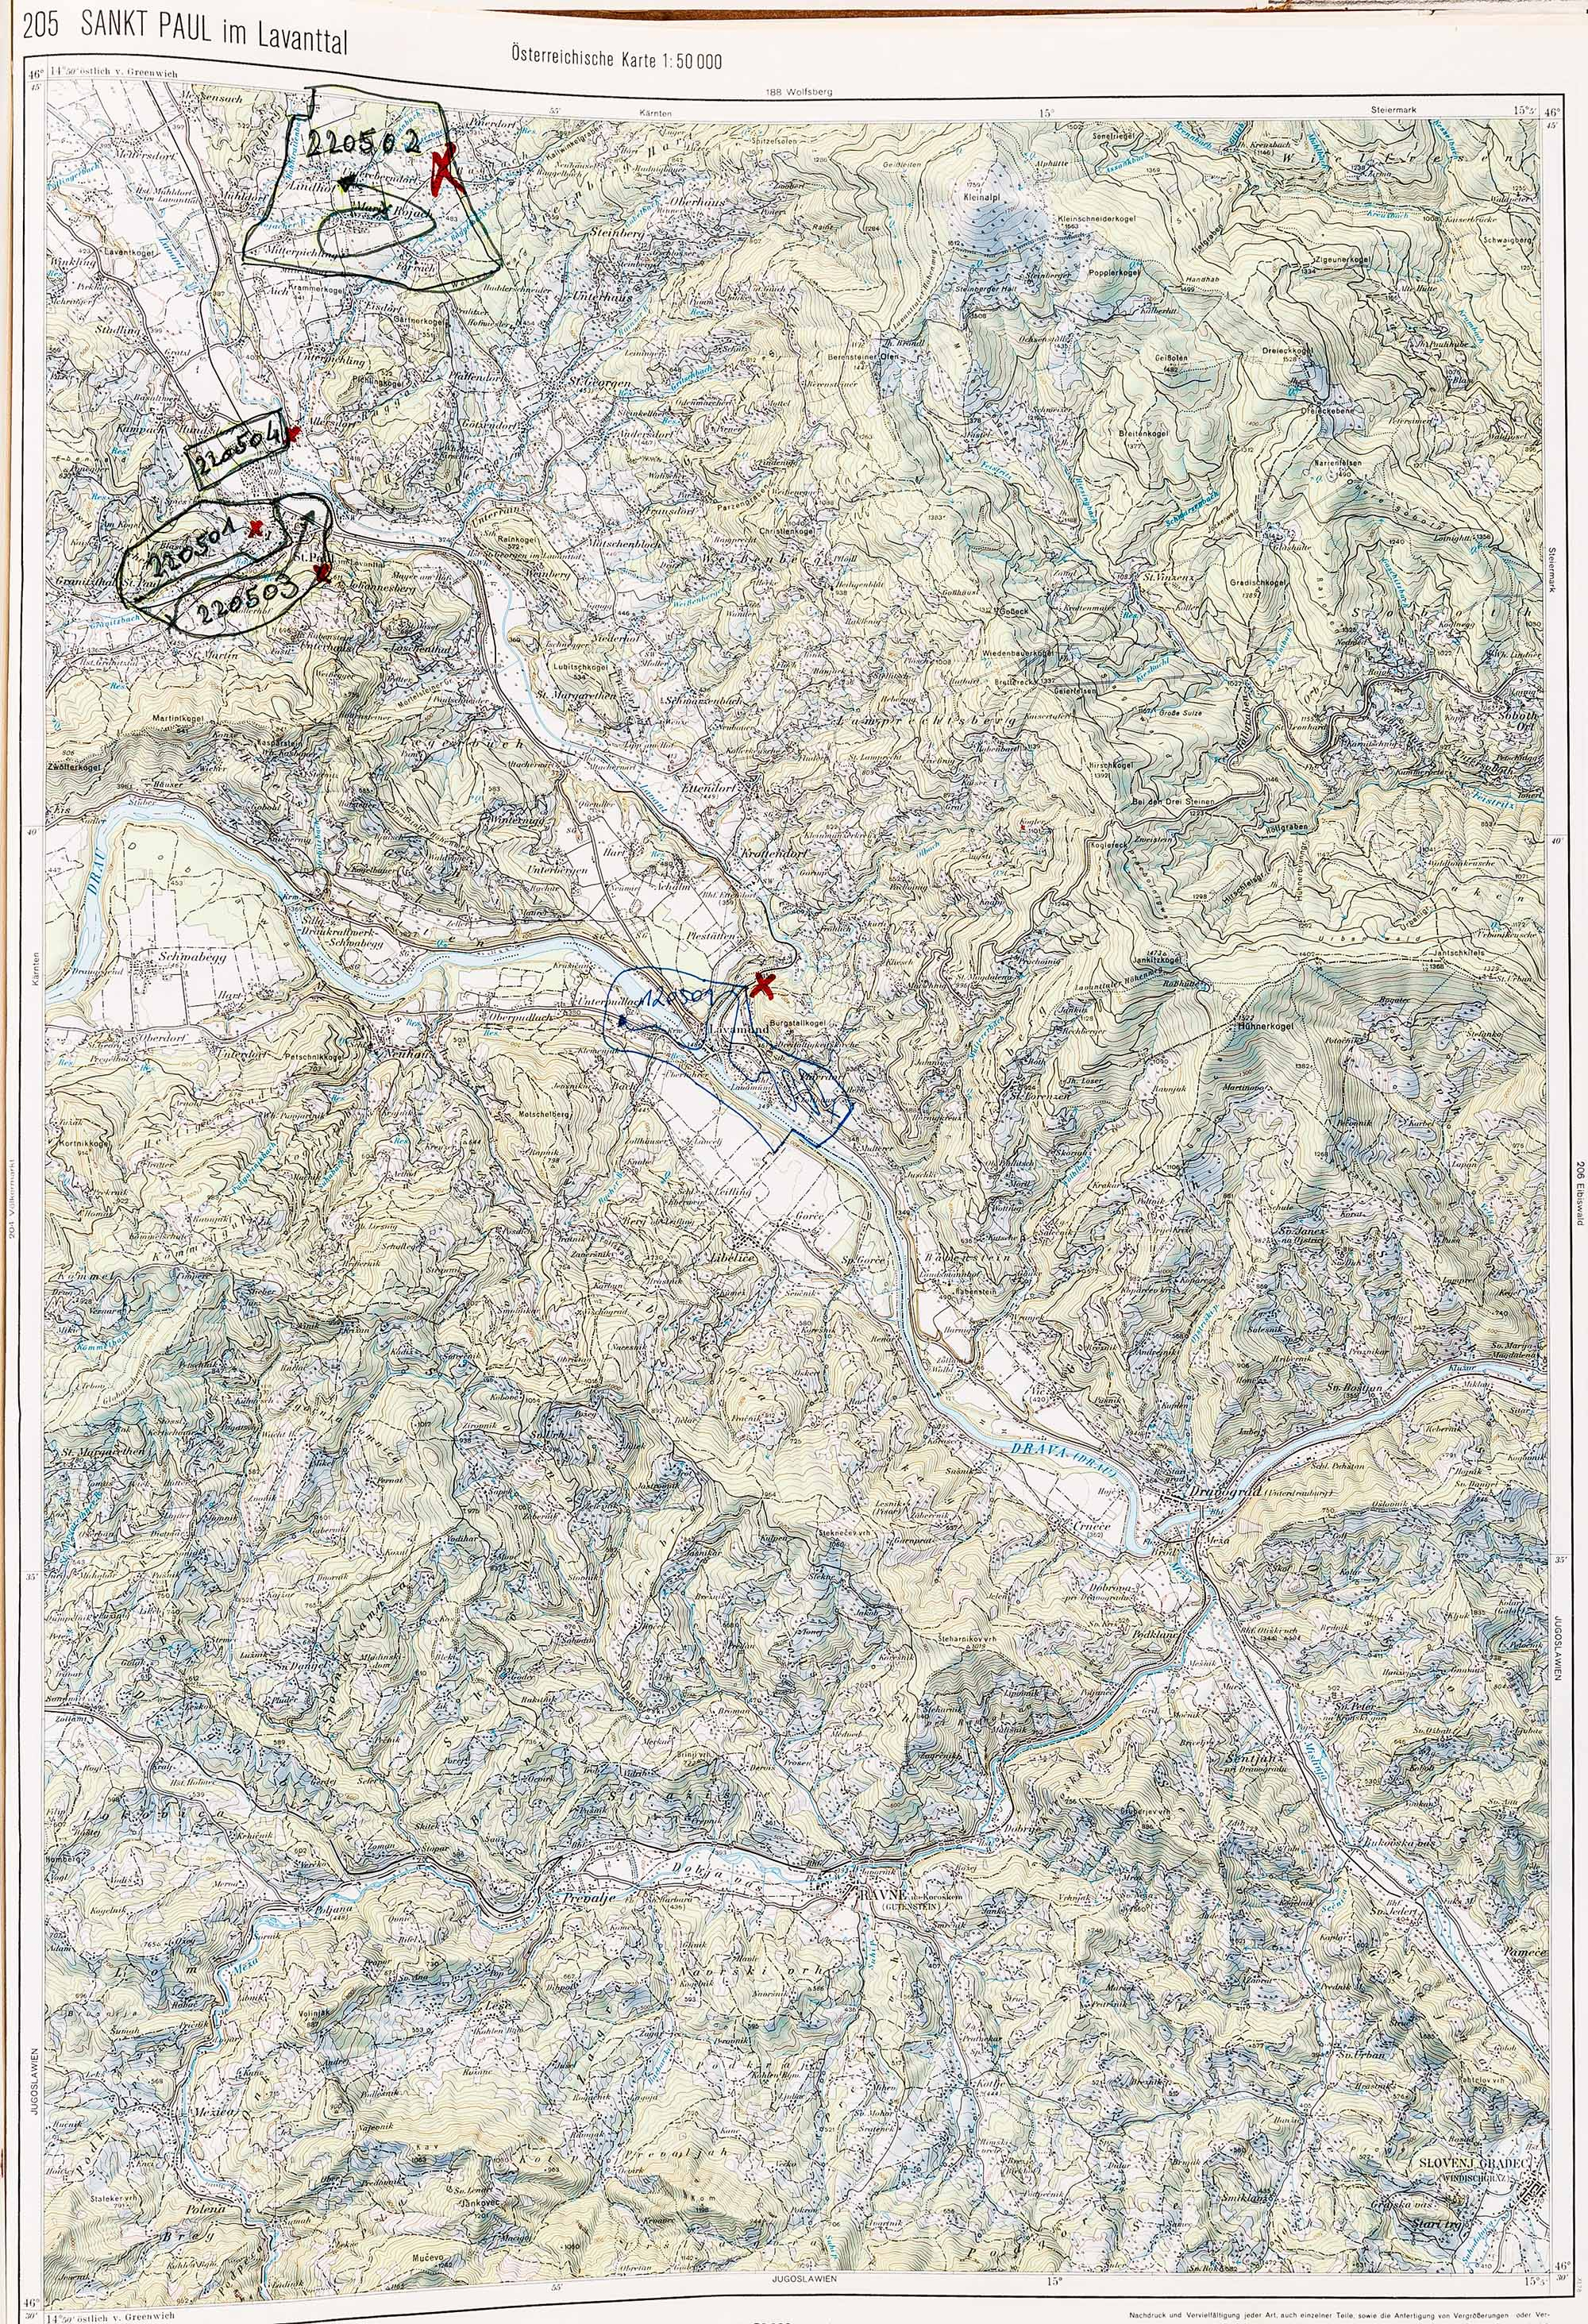 1979-1982 Karte 205